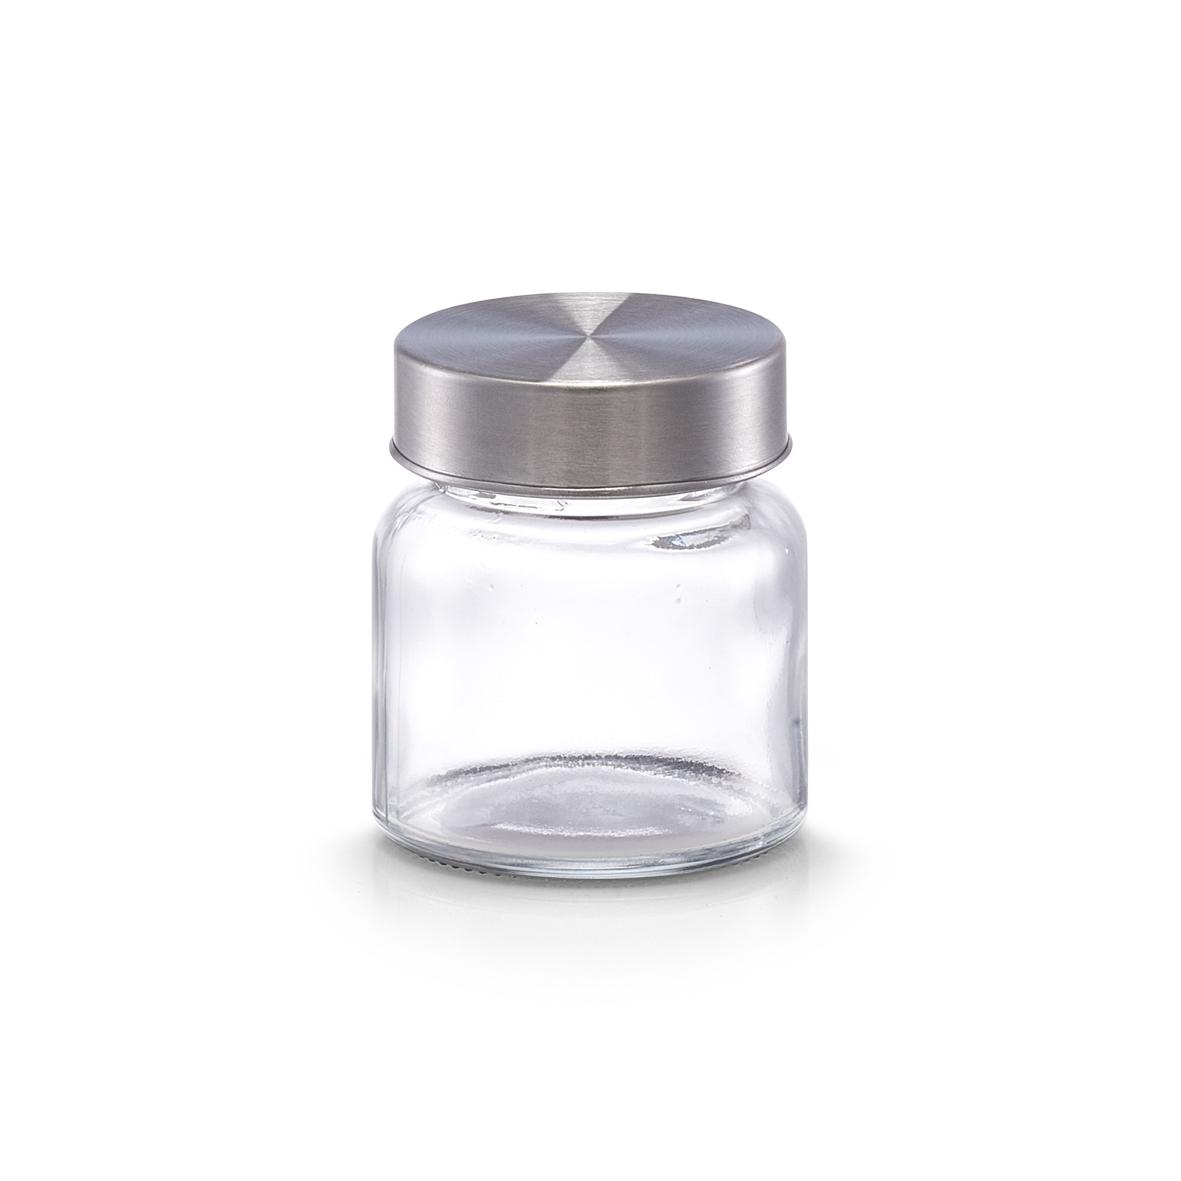 Recipient pentru depozitare din sticla Mini, capac metalic, 75 ml, Ø 5,6xH6,3 cm( 474758)